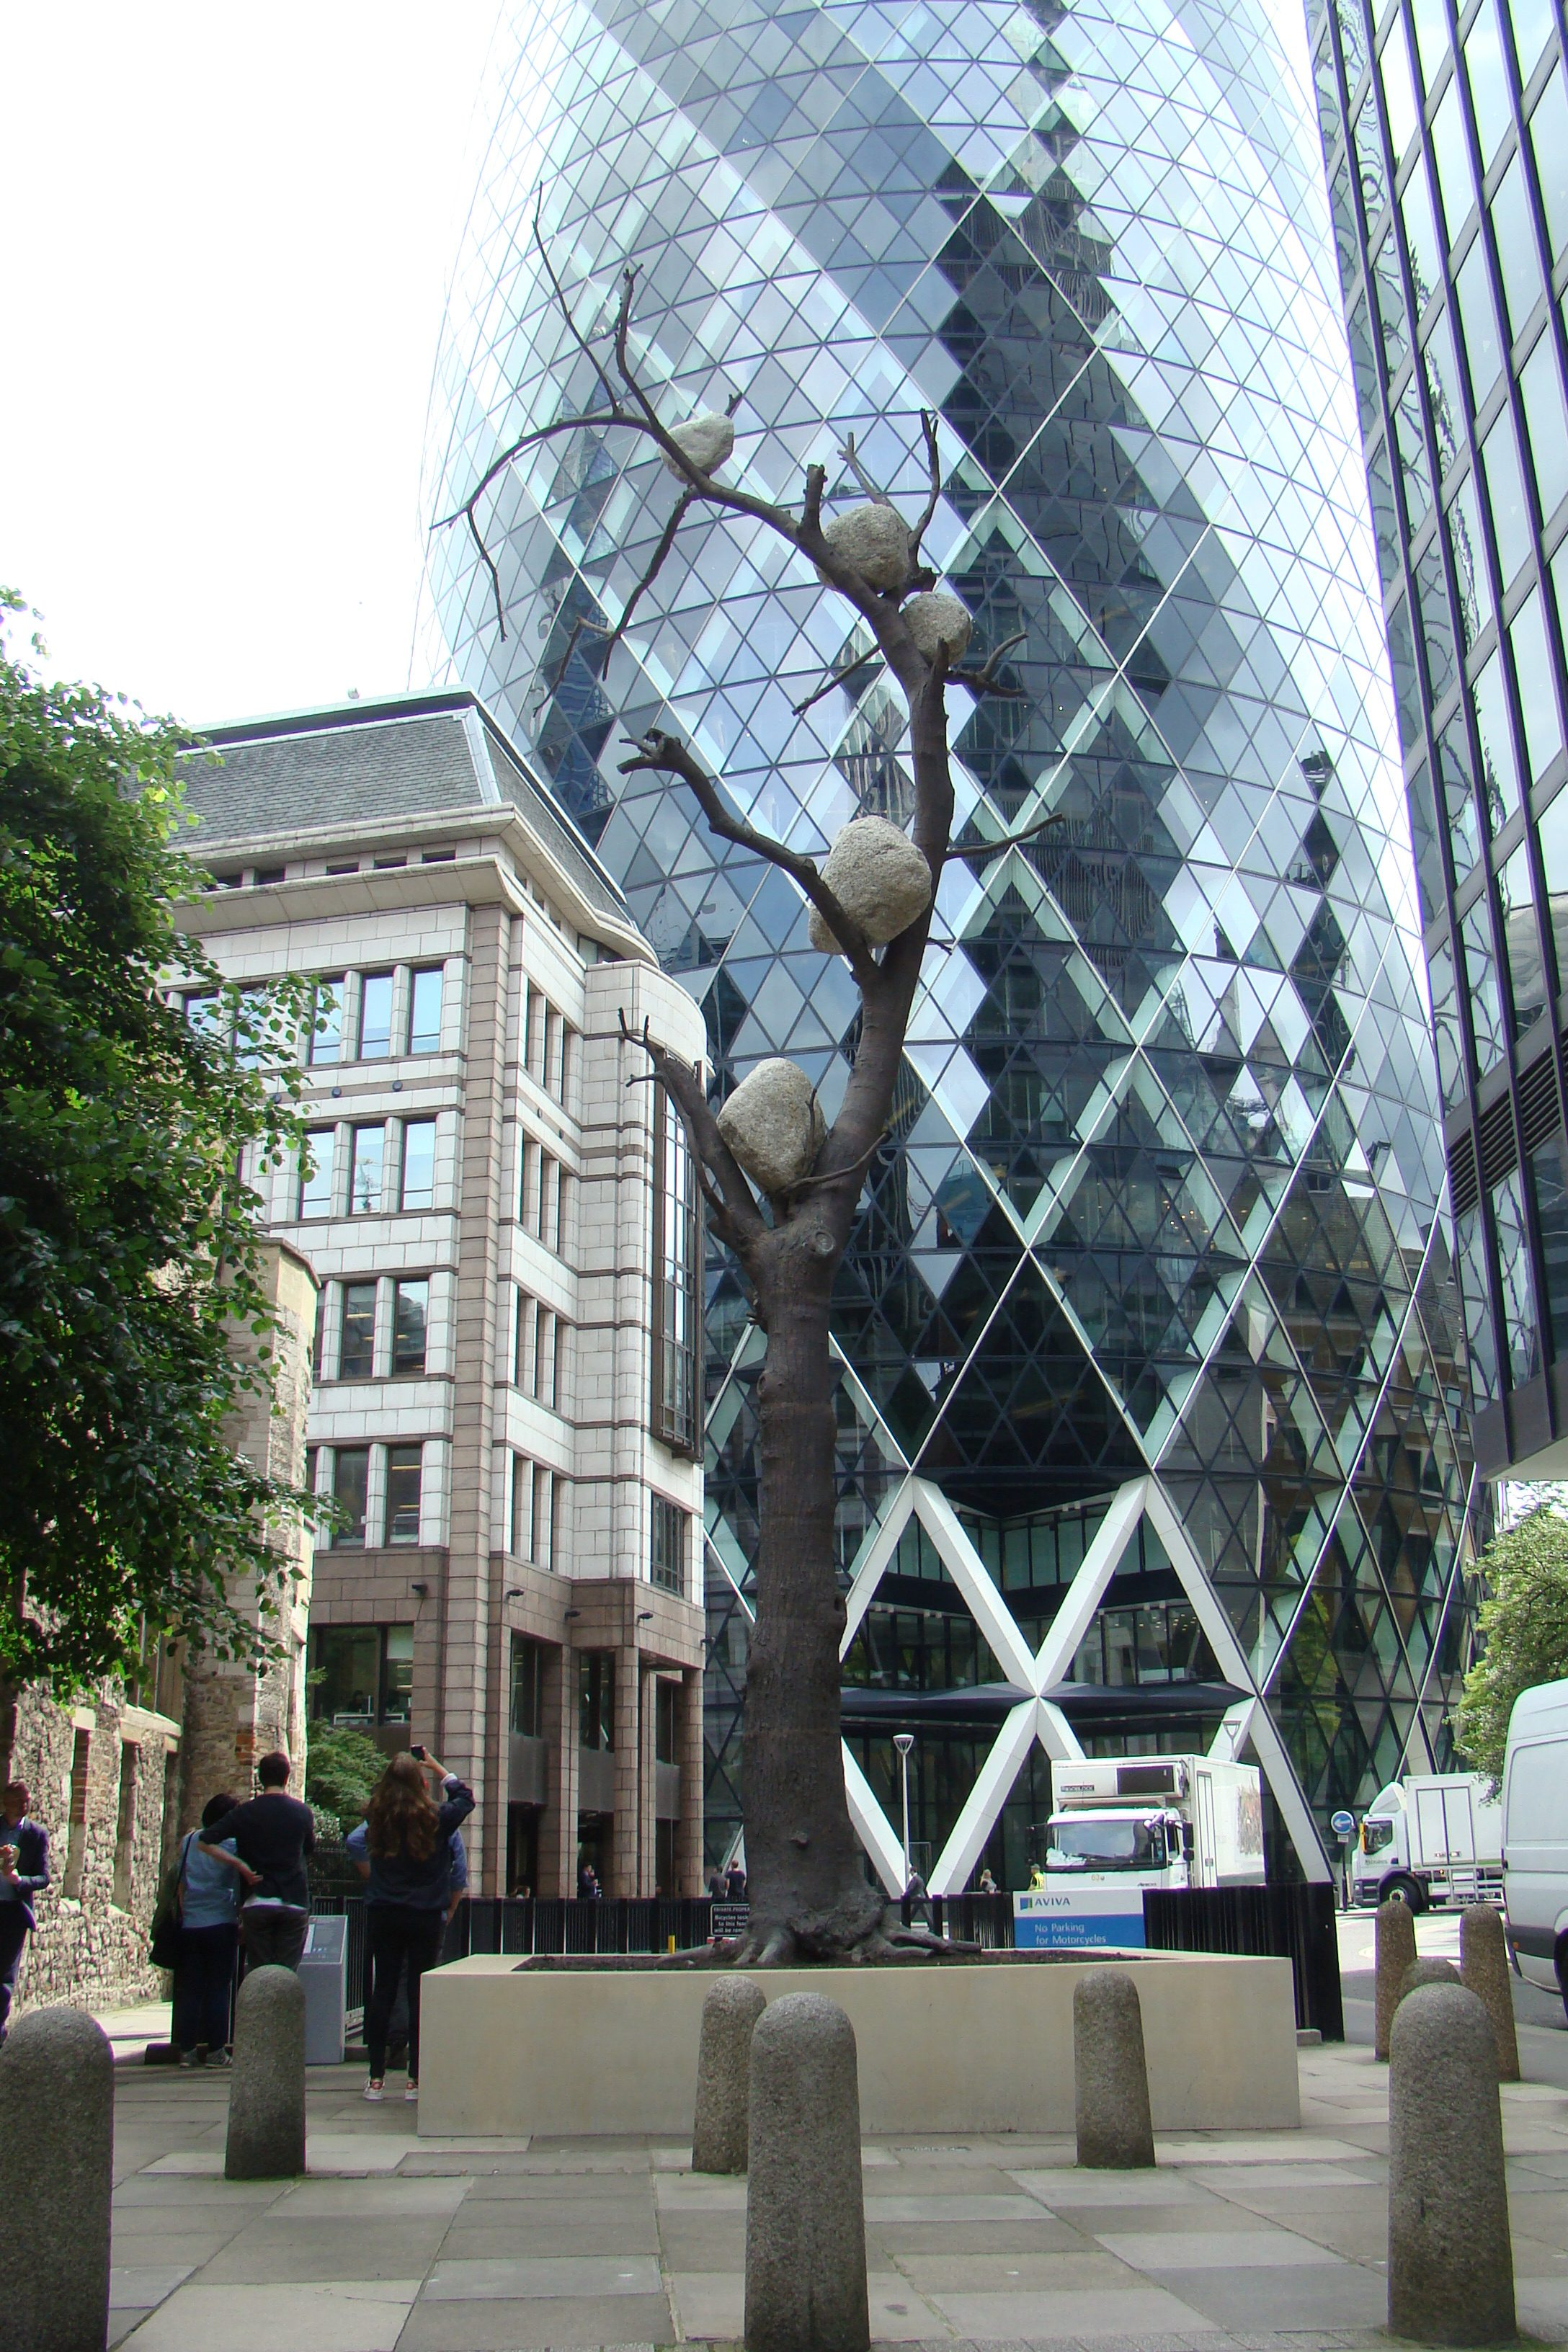 Sculpture in the City 2016, Londra - Giuseppe Penone